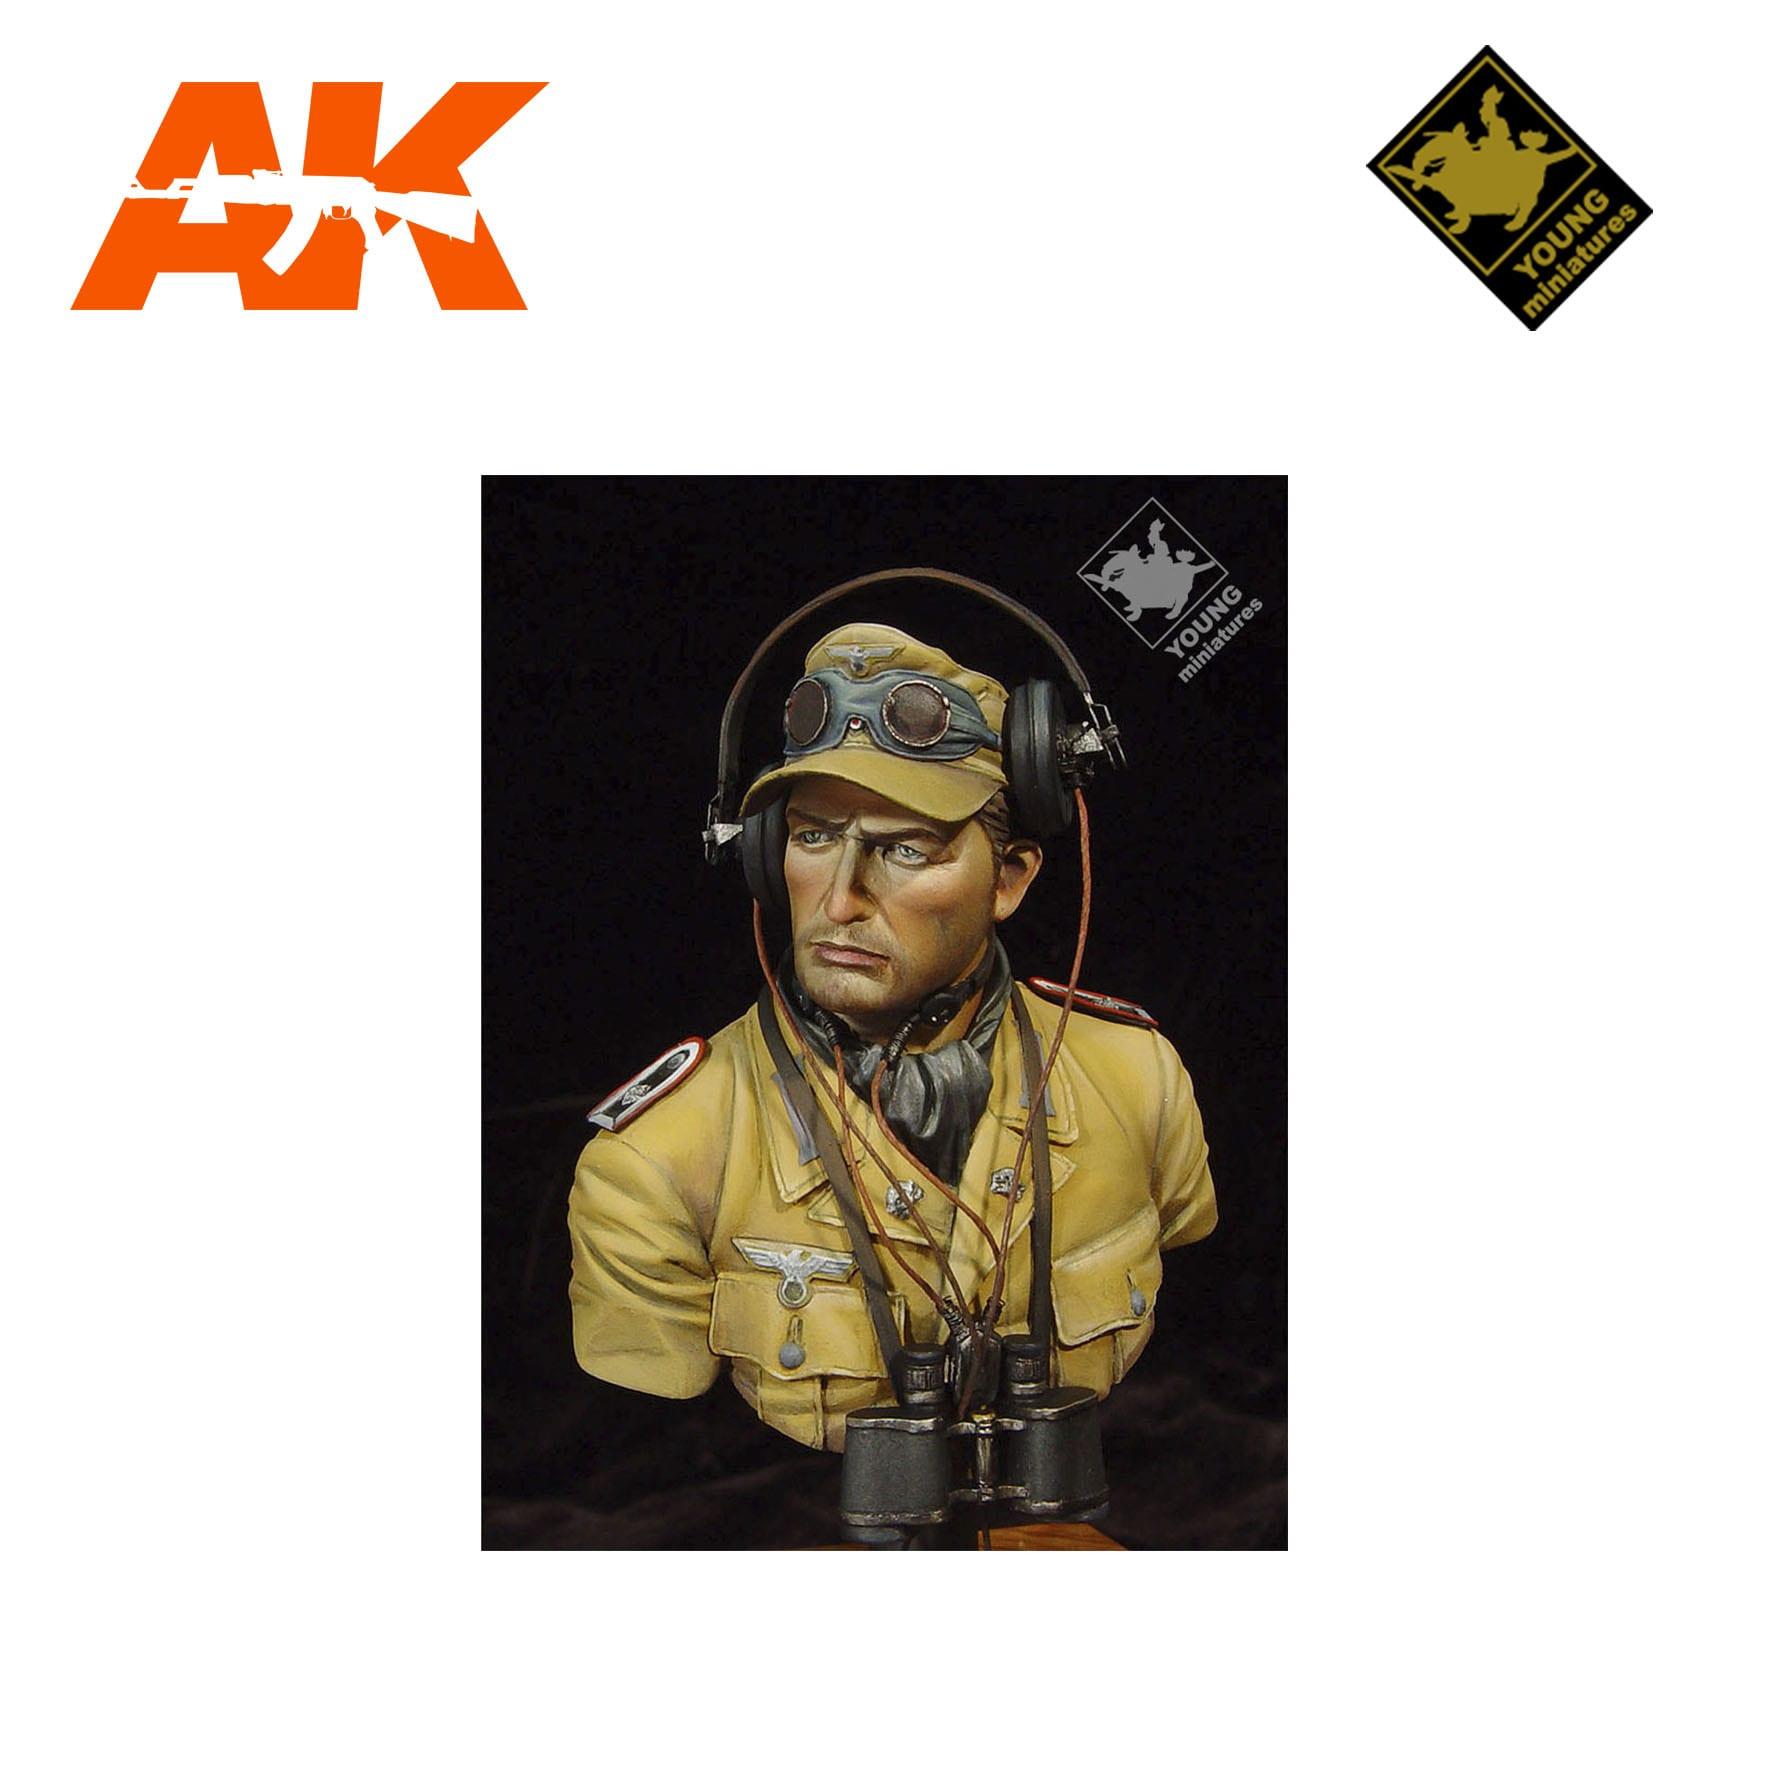 YM YM1802 DAK PANZER OFFICER AK-INTERACTIVE YOUNG MINIATURES